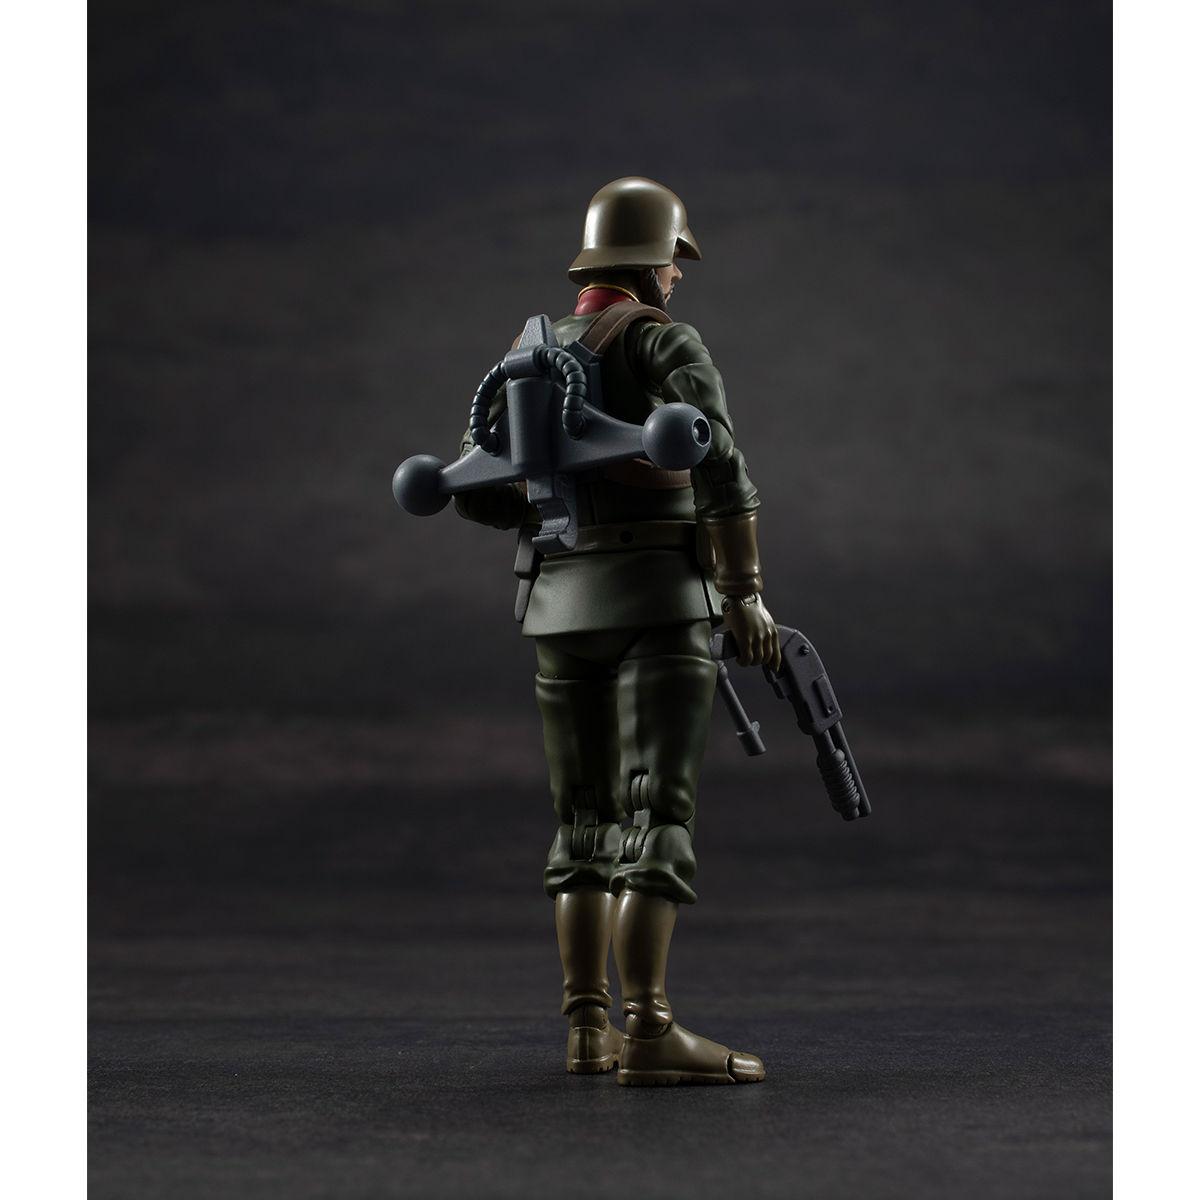 G.M.G. ガンダムミリタリージェネレーション『ジオン公国軍一般兵士01』1/18 可動フィギュア-011